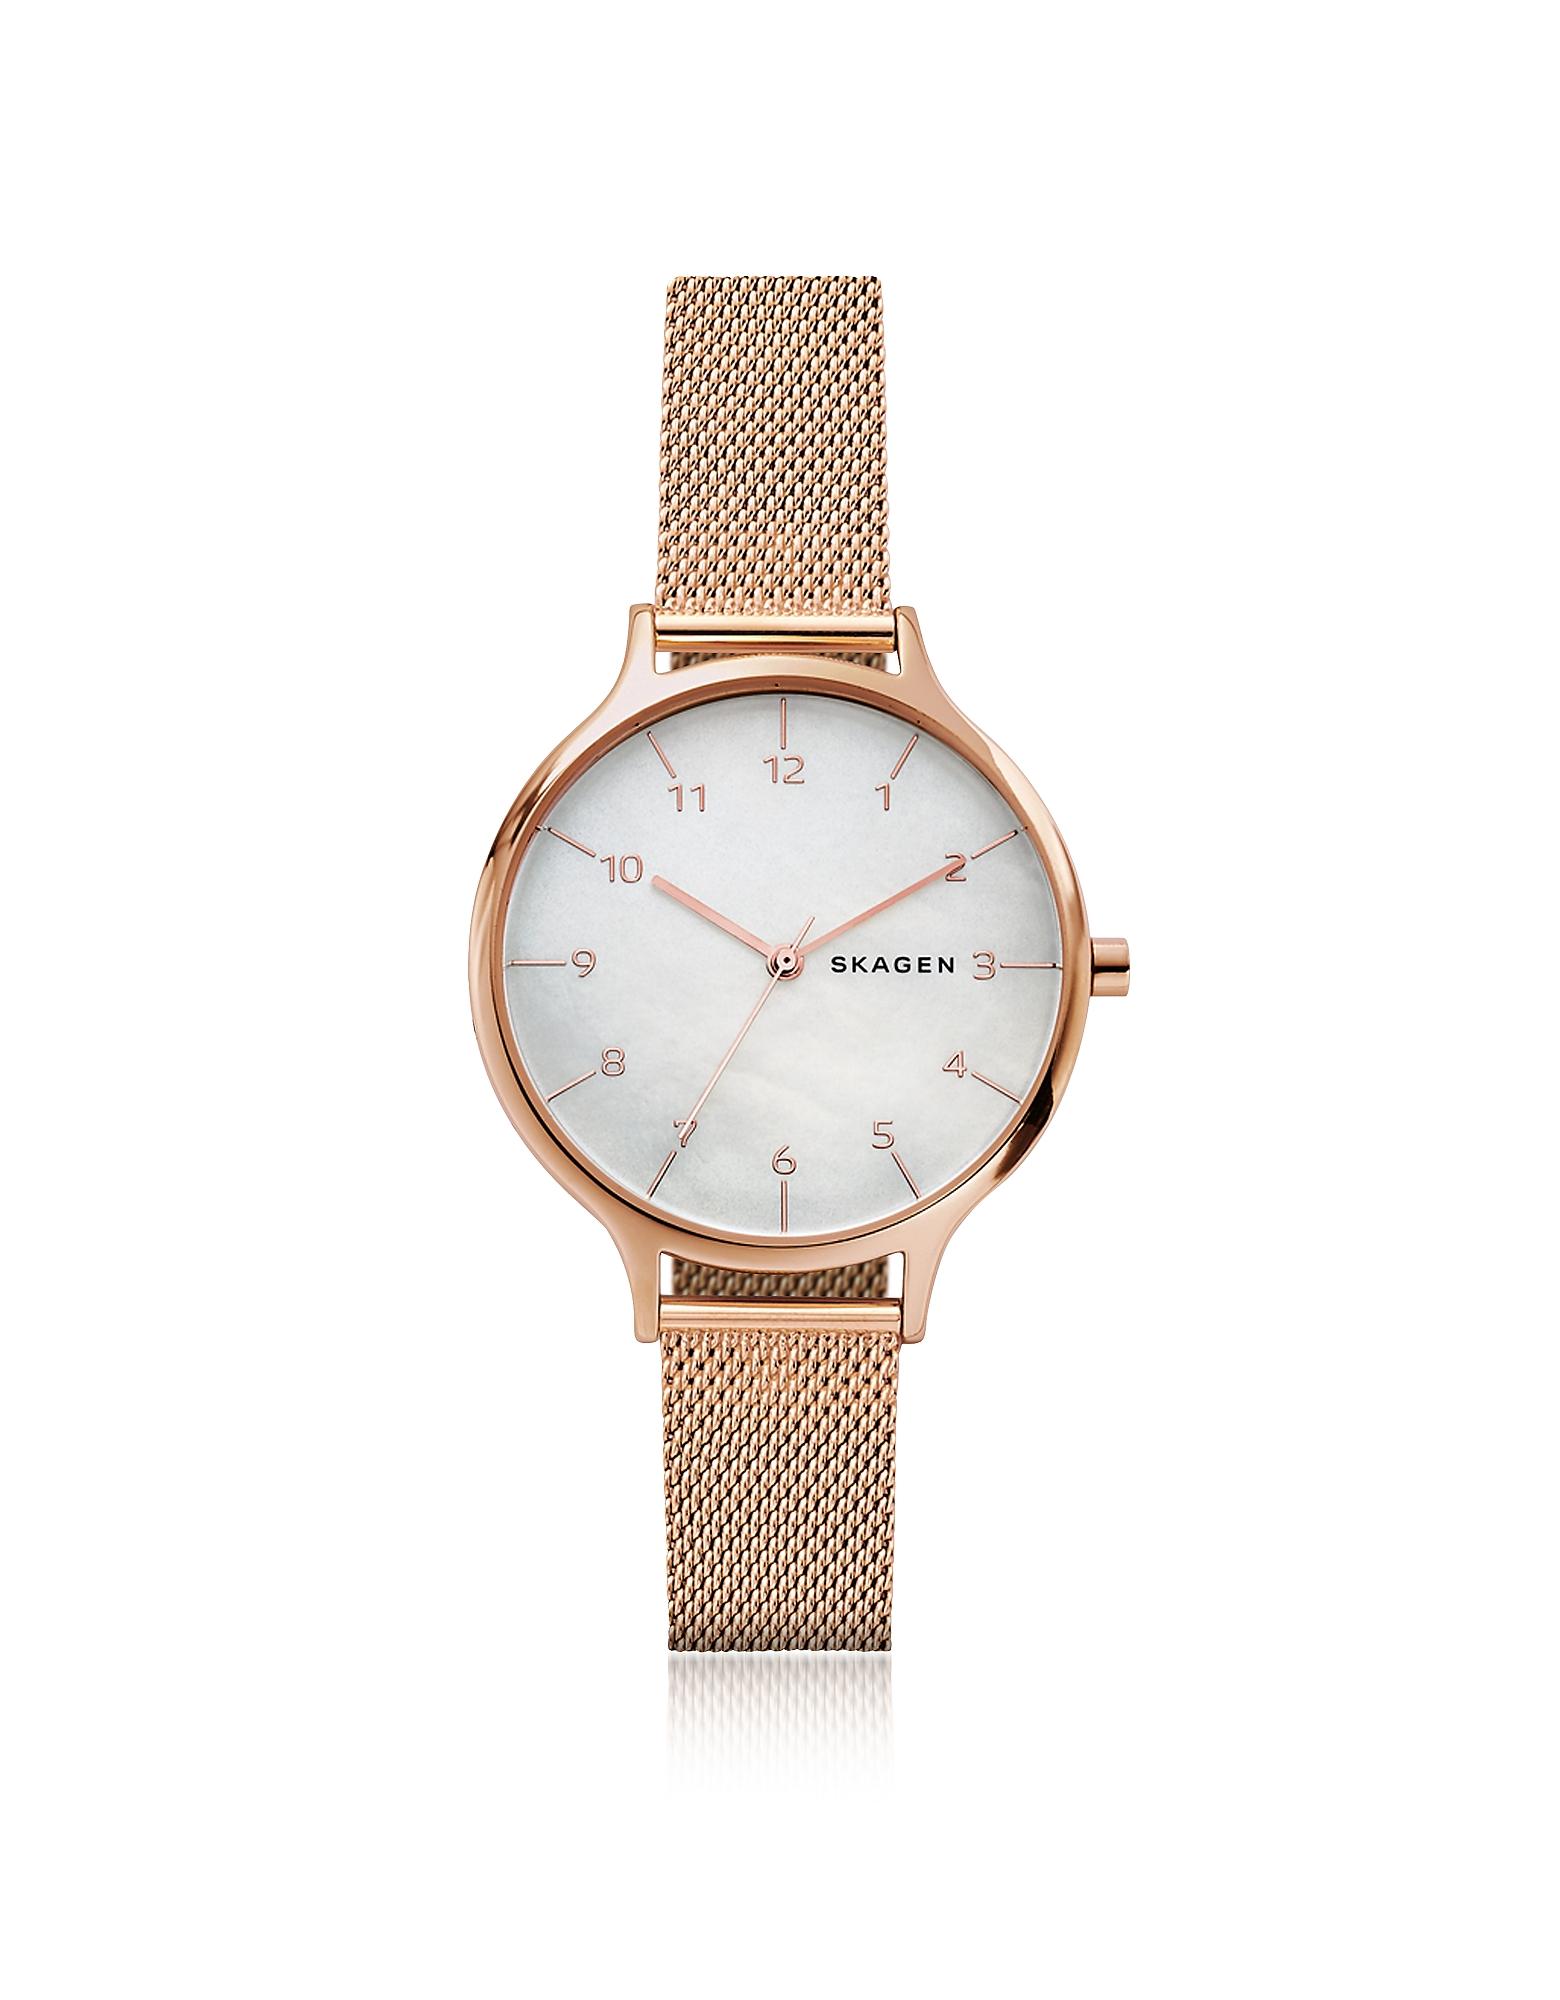 Skagen Women's Watches, Anita Mother of Pearl Rose-Tone Steel-Mesh Watch